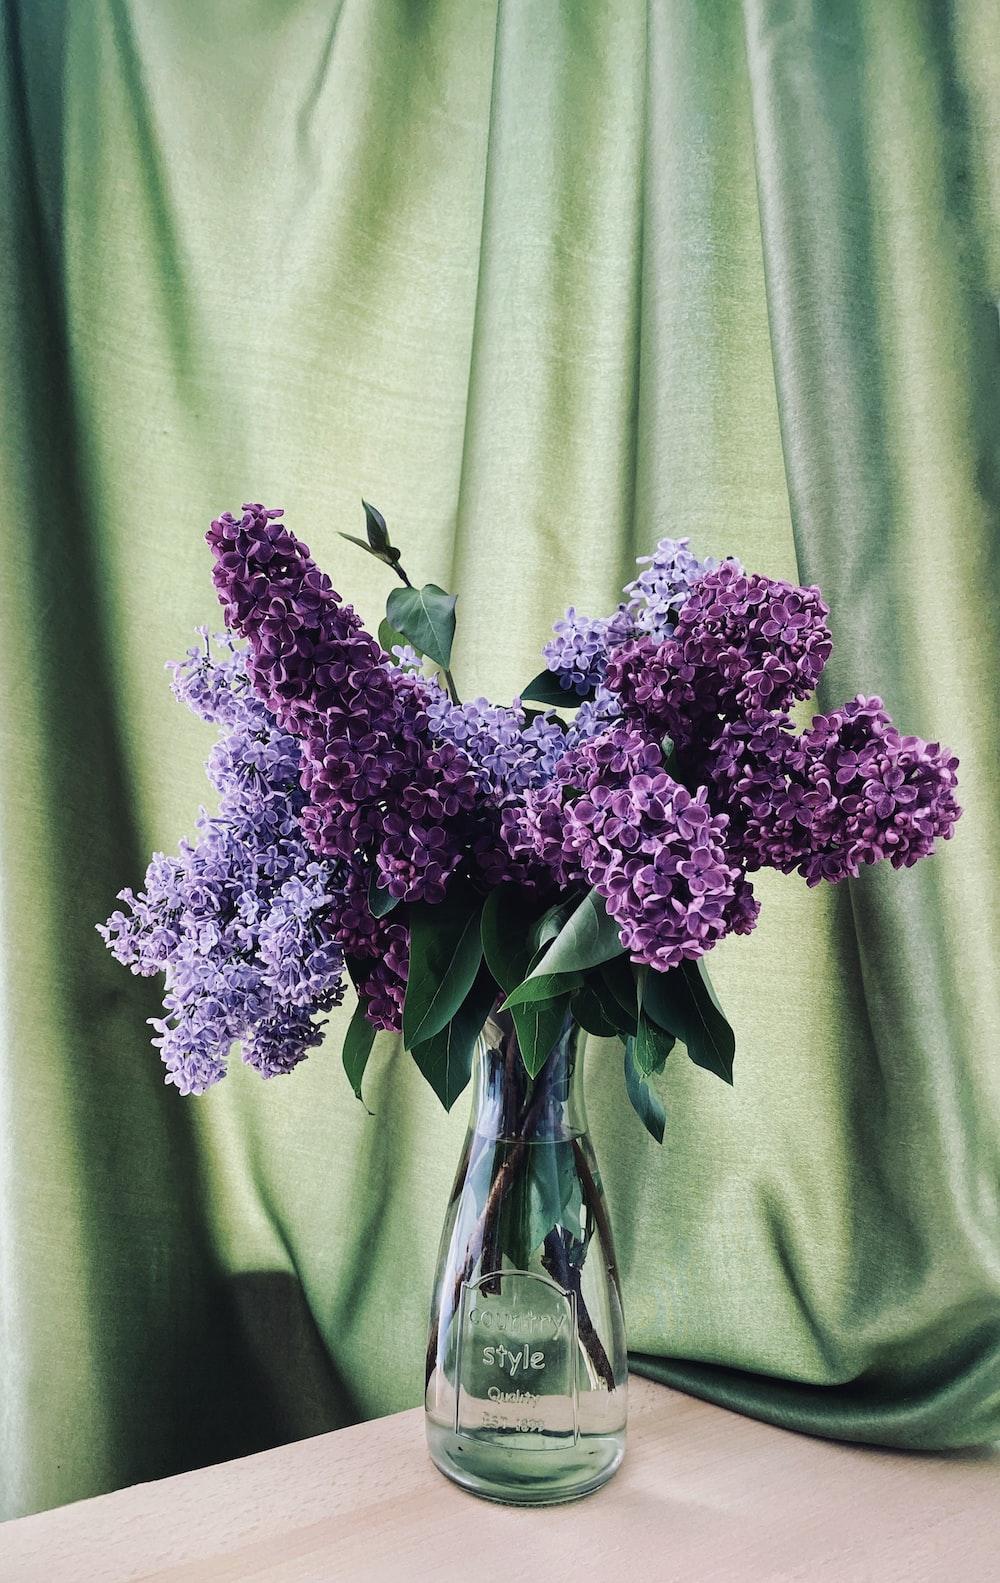 purple flowers on green textile